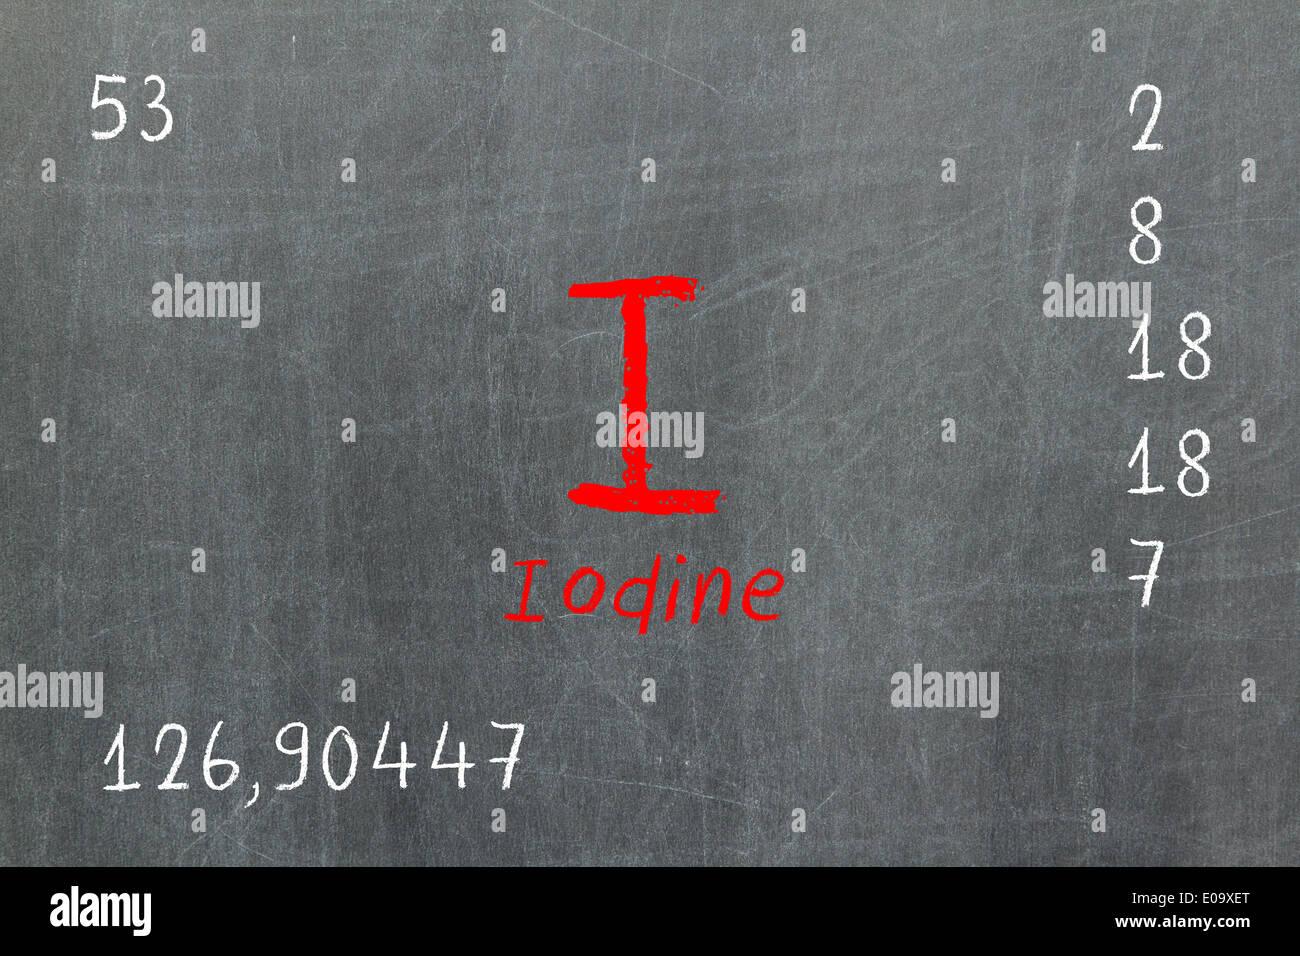 Isolated Blackboard With Periodic Table Iodine Chemistry Stock Photo